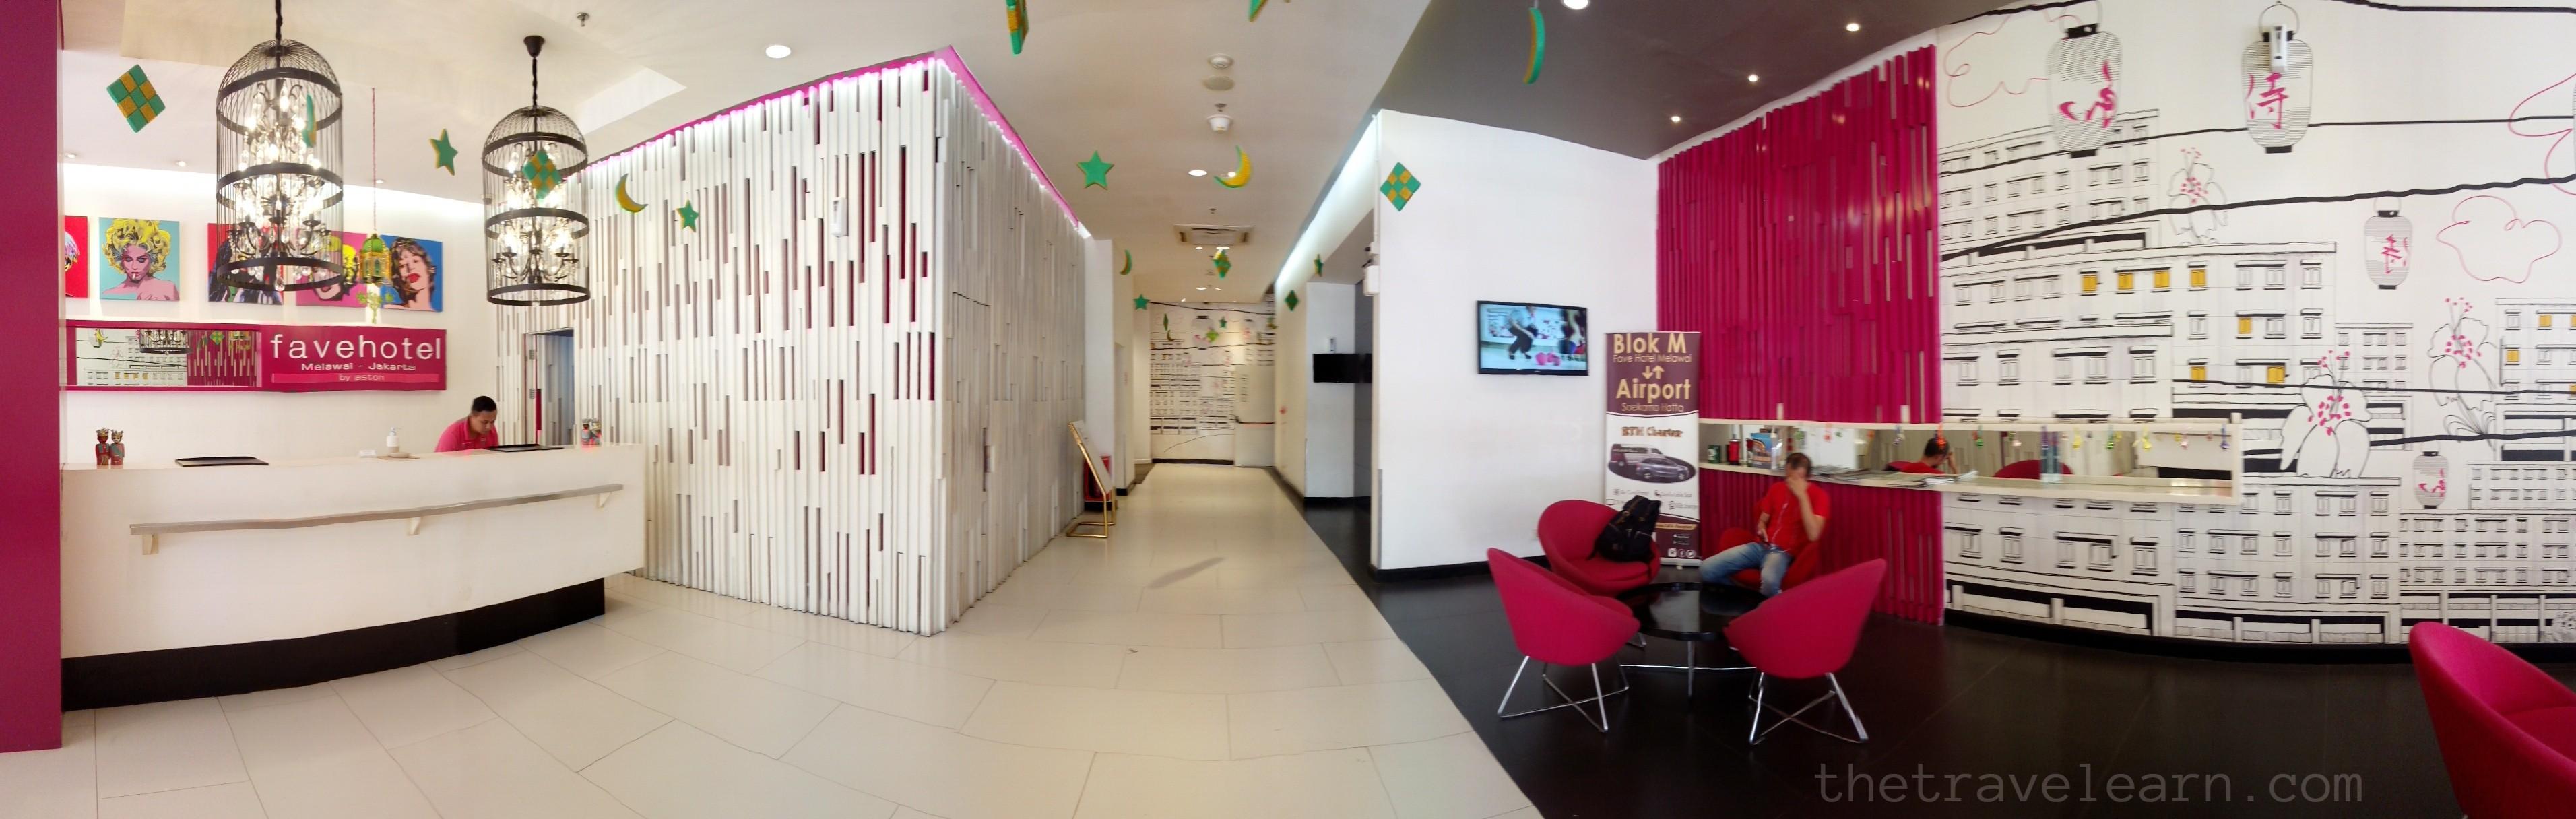 Favehotel Melawai Dekat Stasiun Mrt Blok M Hotel Murah Tapi Kamar Dan Sarapannya Juara The Travelearn